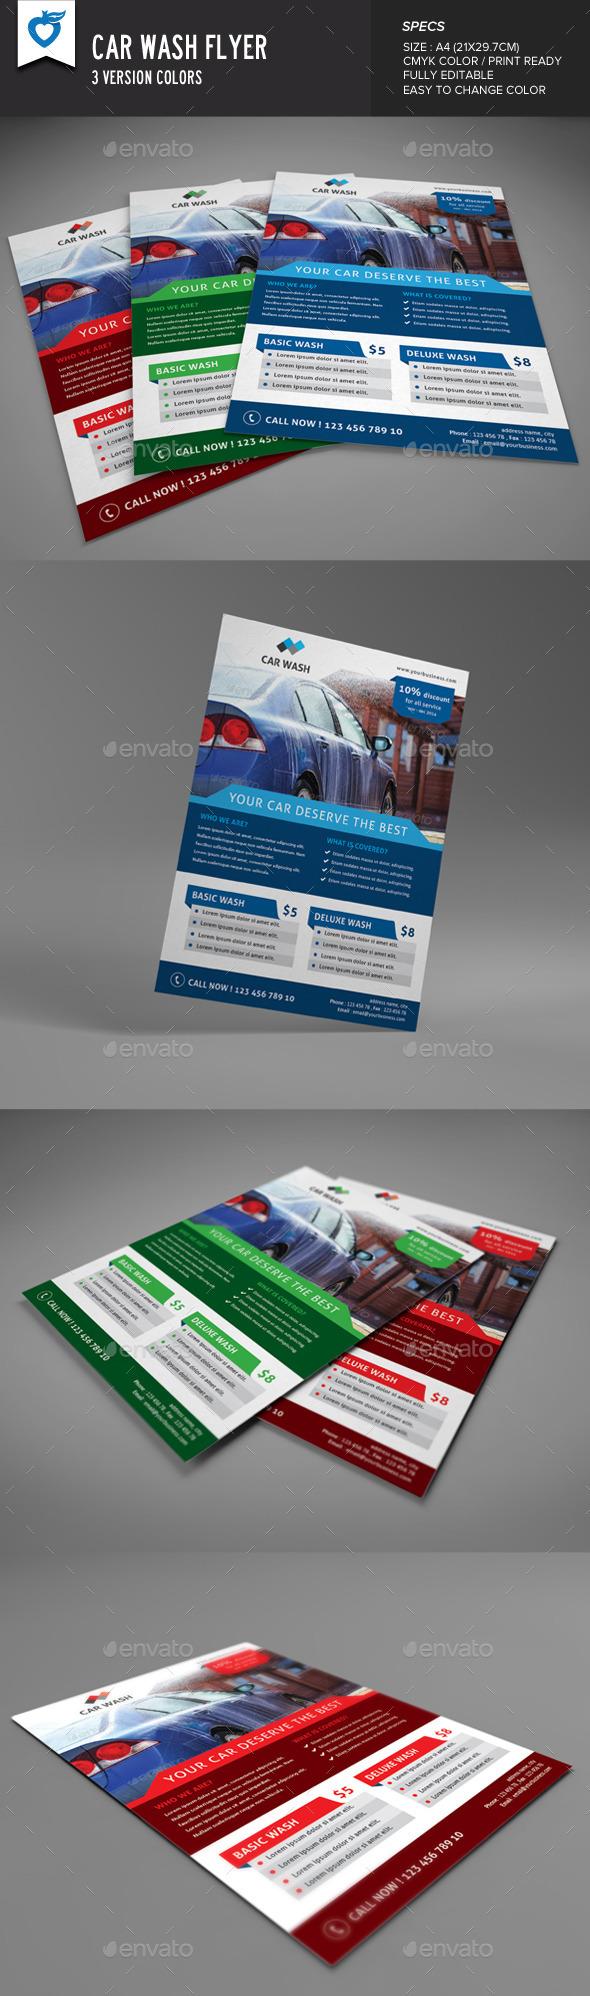 GraphicRiver Car Wash Flyer 9575729